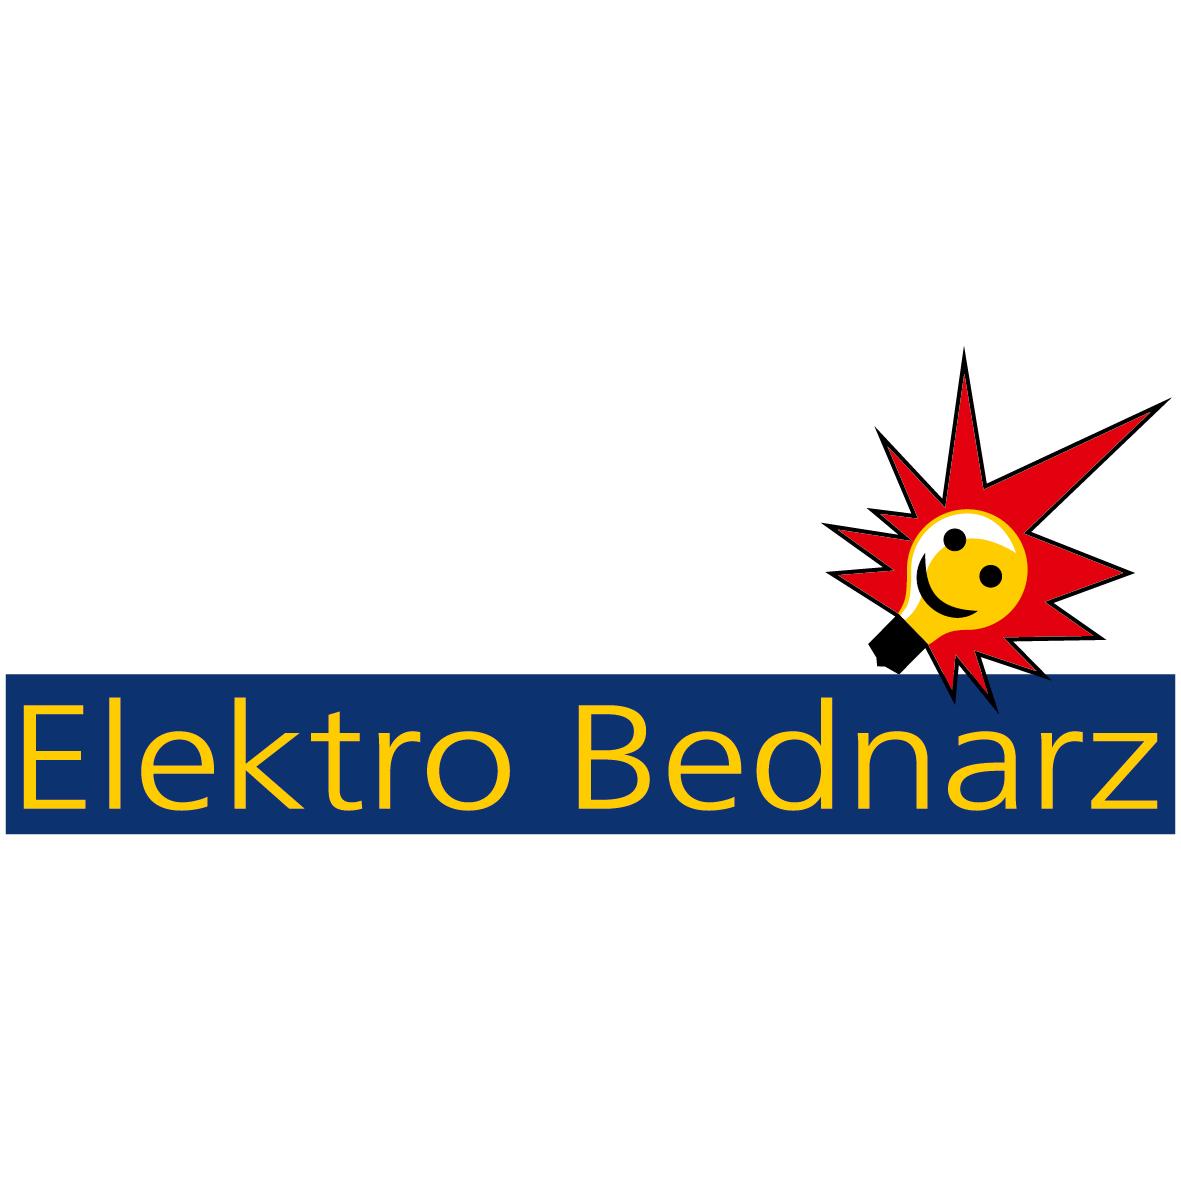 Elektro Bednarz e. K. • Emmerich, Gerhard Storm 28 Straße 28 Storm a6eb72